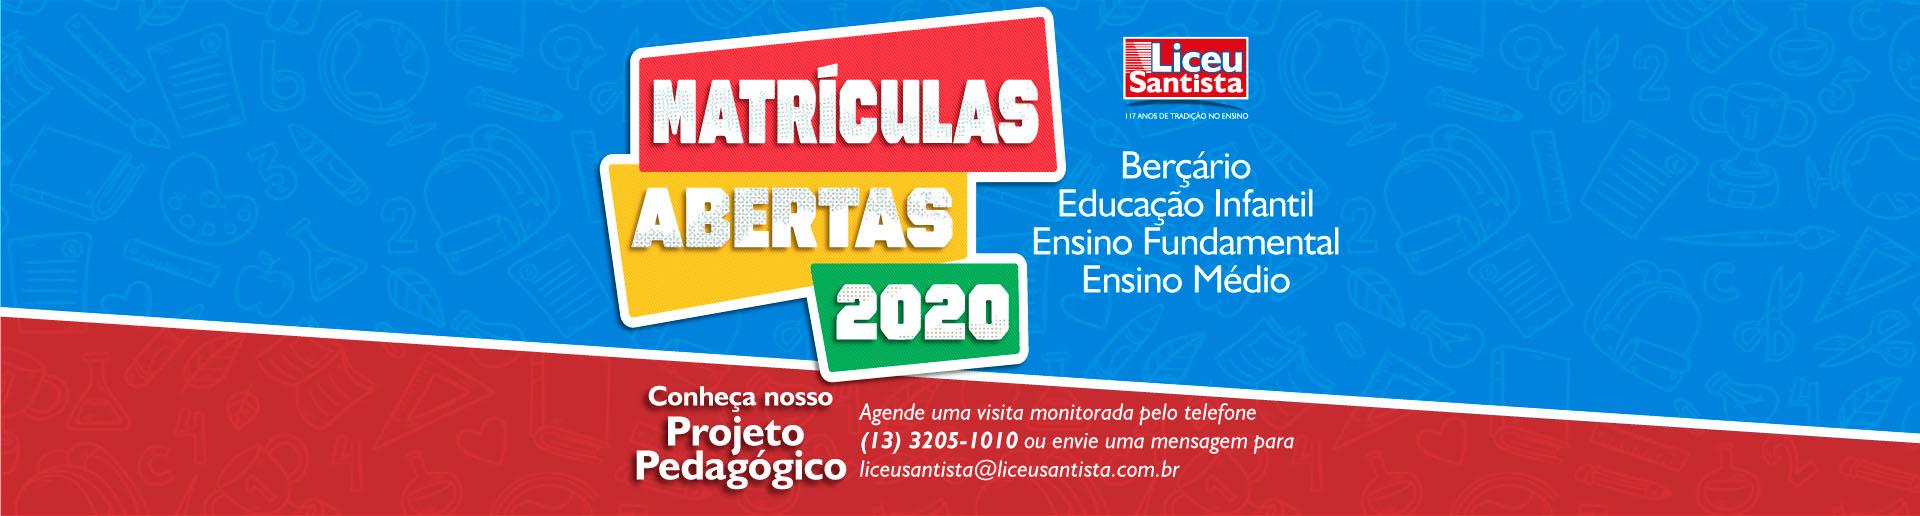 LS-Matriculas-Abertas-2020-New-1920x516px